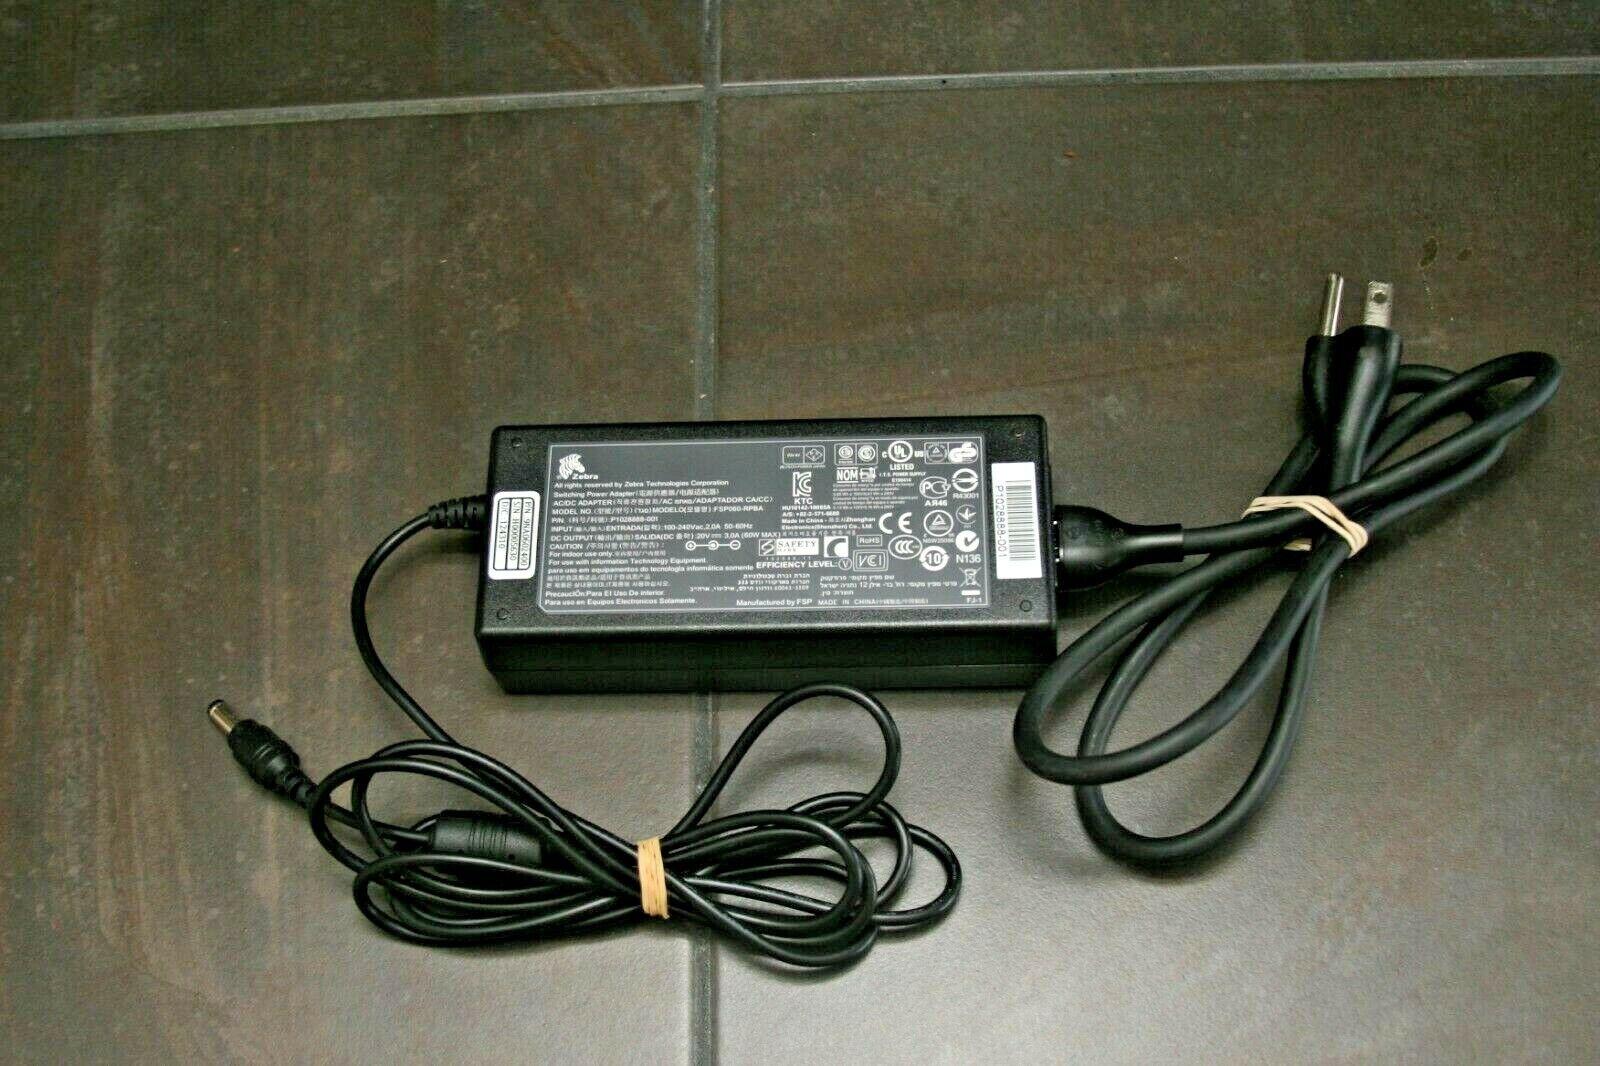 P1028888-001 9NA0602400 Power Supply Cord Accessory USA 20V 3A AC DC Adapter for Zebra FSP060-RPBA FSP060 RPBA P//N